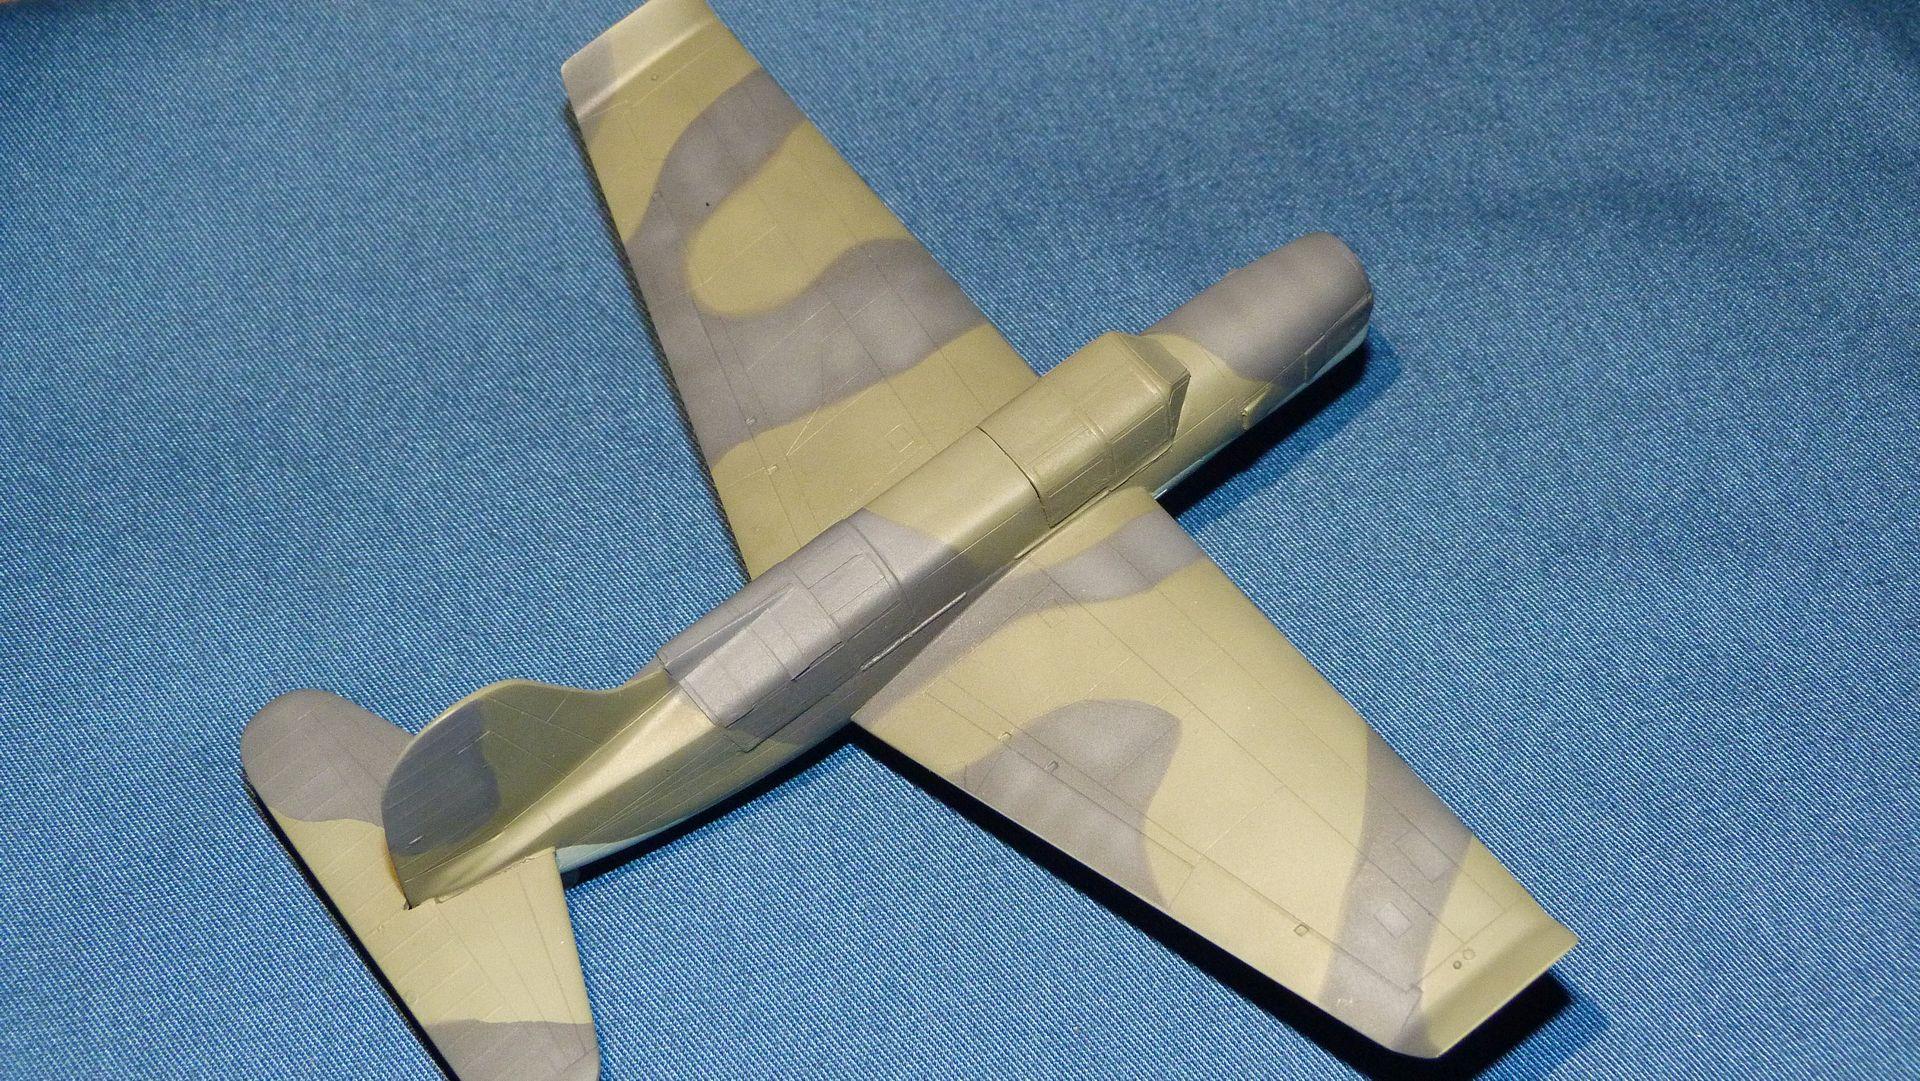 Julklappsbygge: Curtiss Seamew Mk1, Sword 1/72 - Sida 3 32463976547_1a68d41892_o